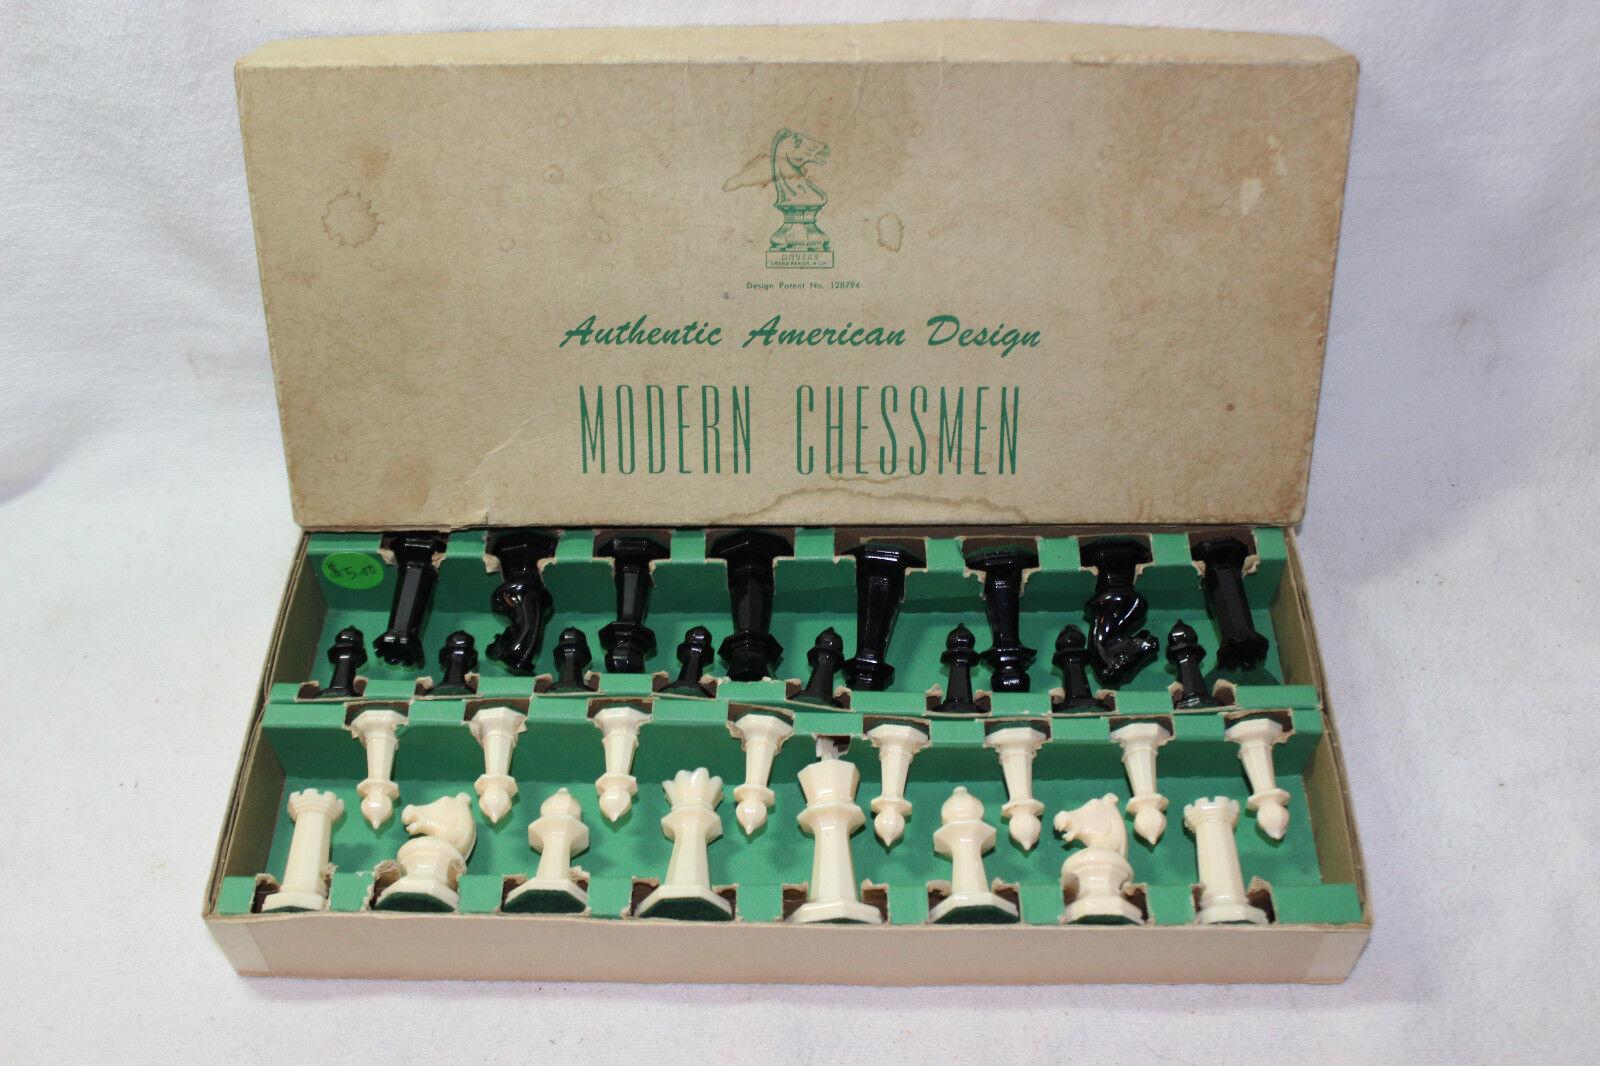 VINTAGE DRUEKE MODERN CHESSMAN PLASTIC CHESS PIECES NO. 128794 SET